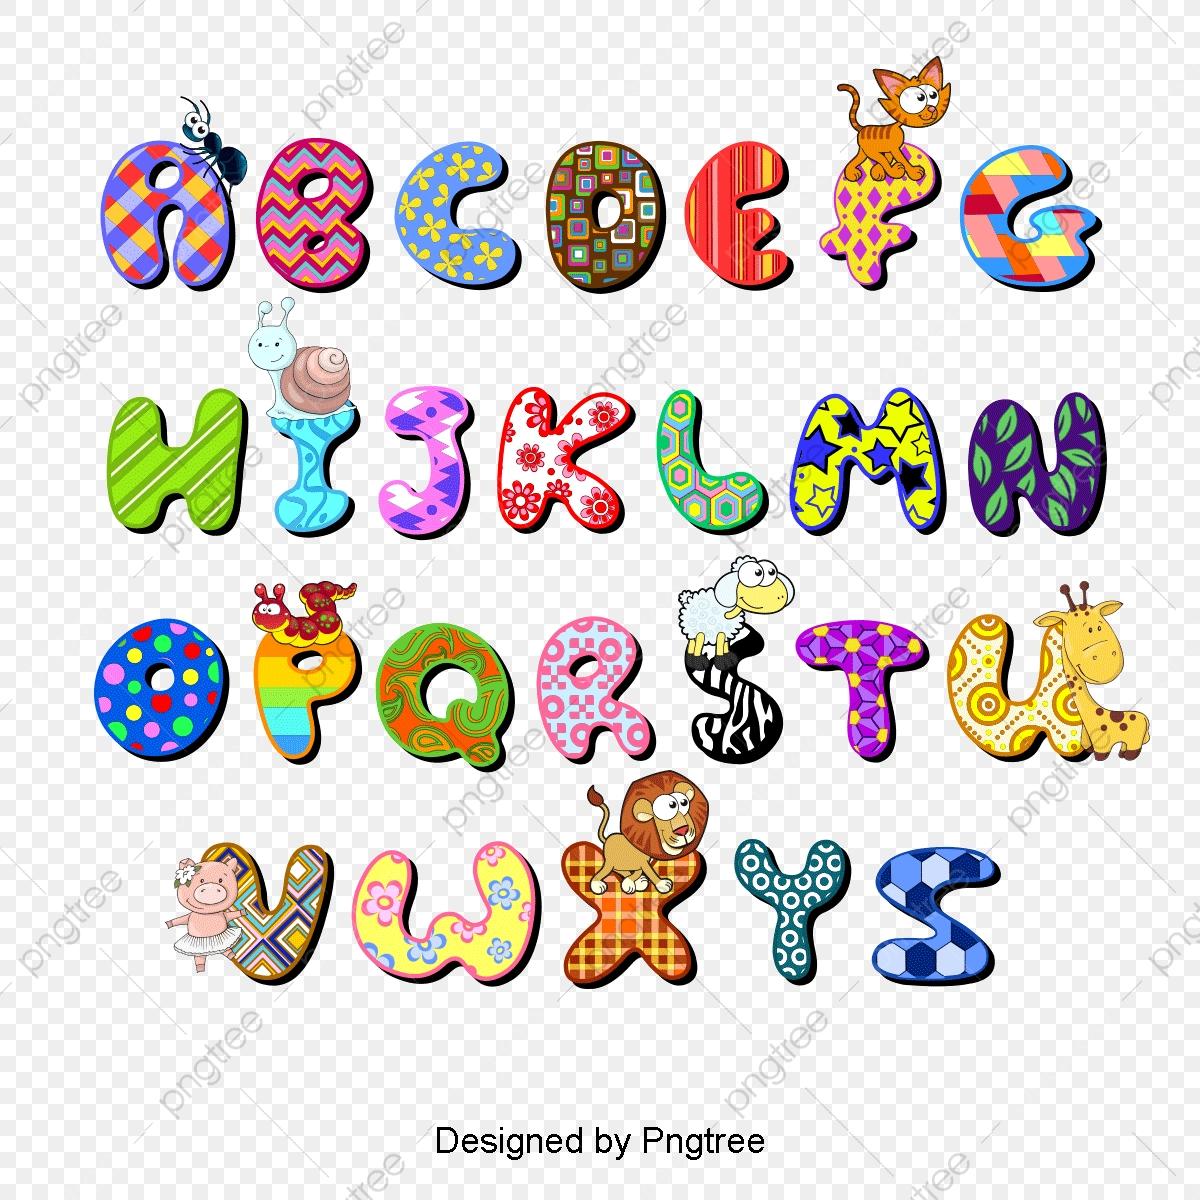 Cartoon Alphabet Vector Material, Alphabet Clipart, Ant, Spider PNG.